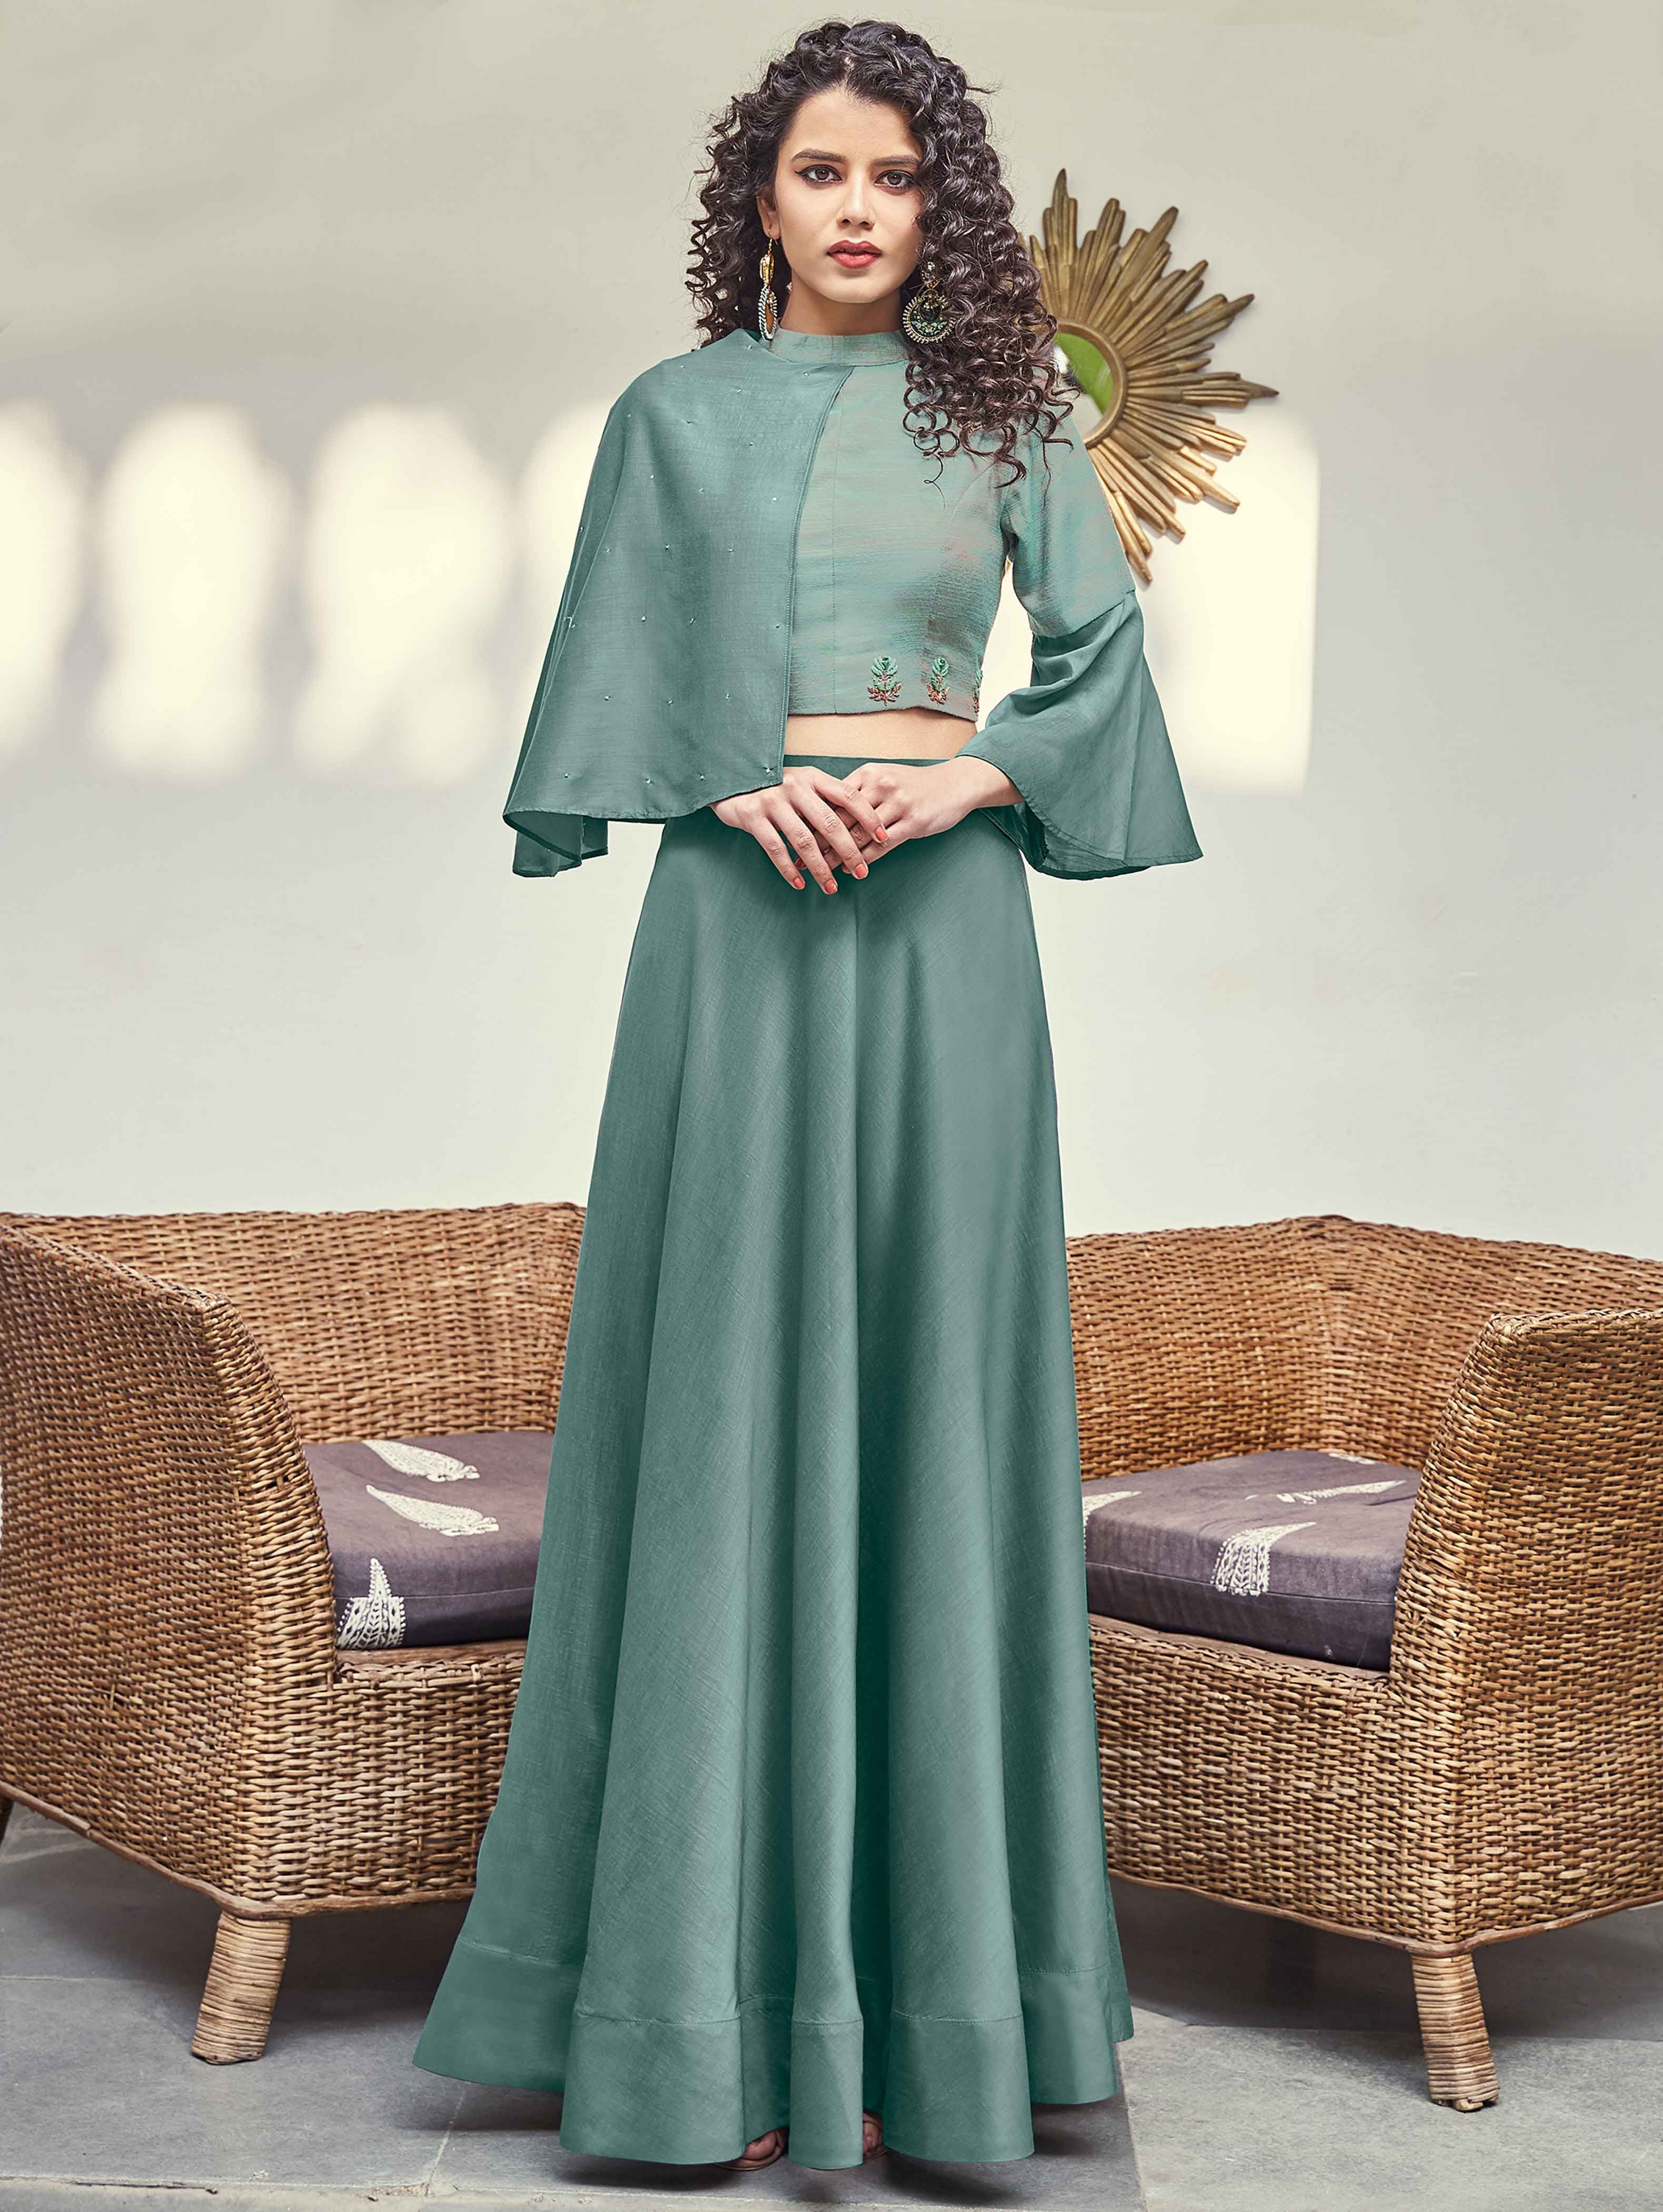 Sage Green Satin Silk Plain Skirt with Fancy Bell Sleeved